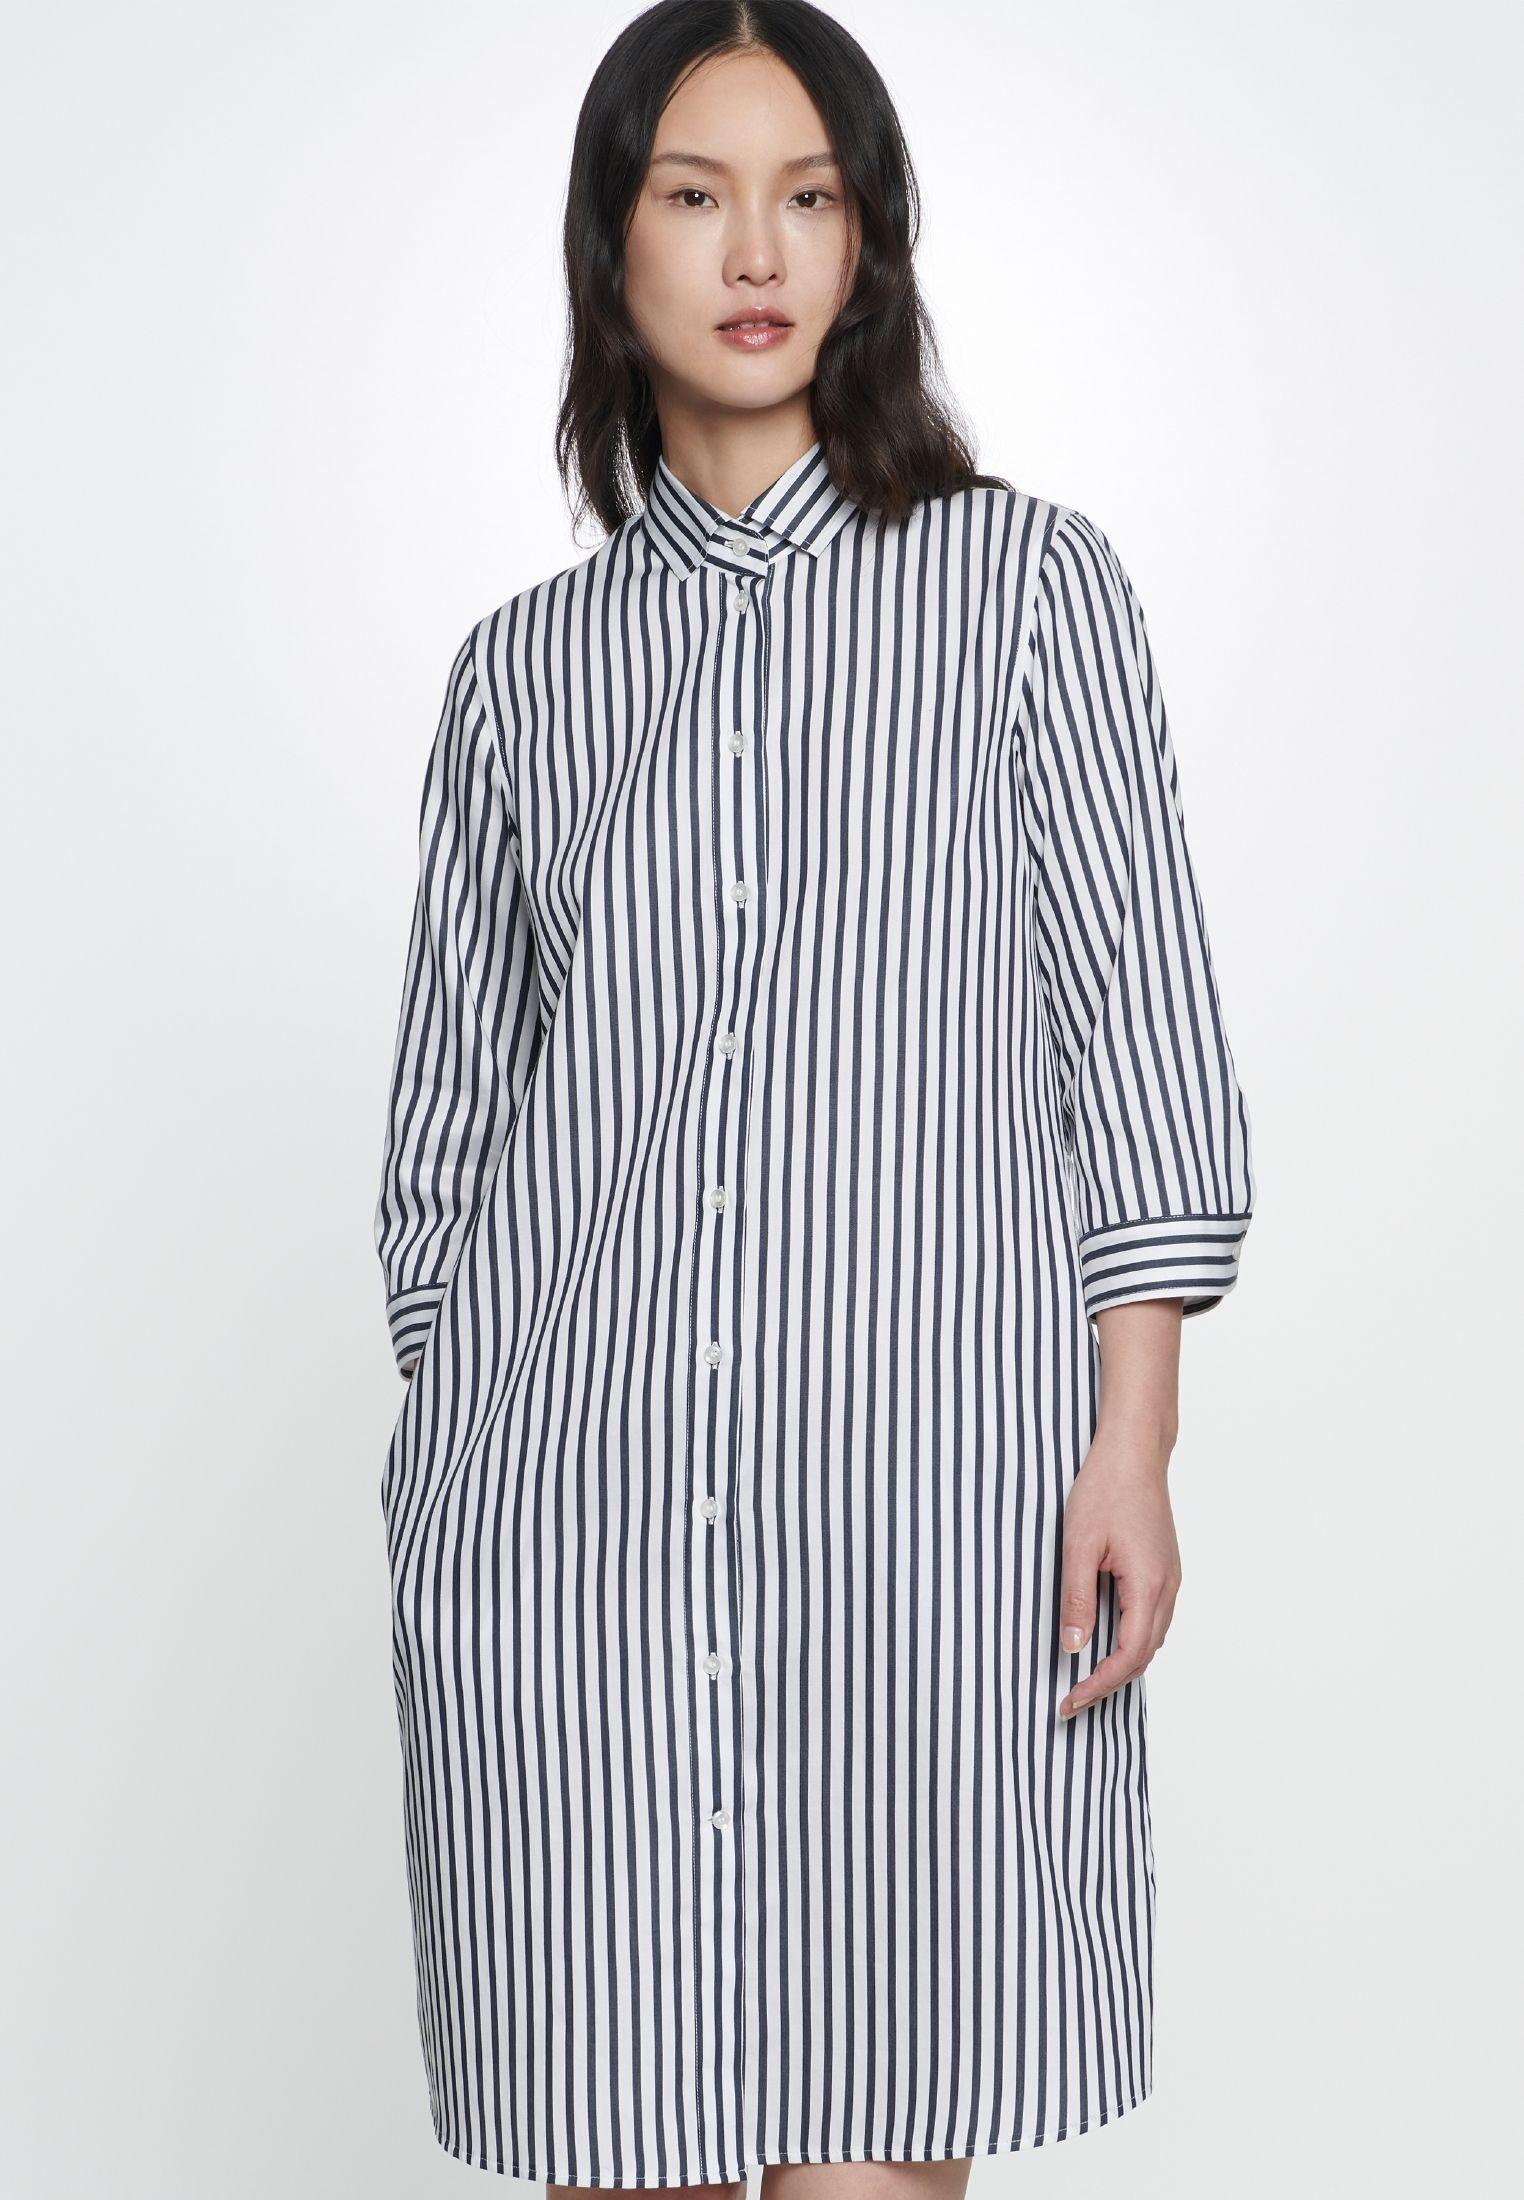 3 4 Arm Kleid. Trendy 3 4 Arm Kleid With 3 4 Arm Kleid. 3 4